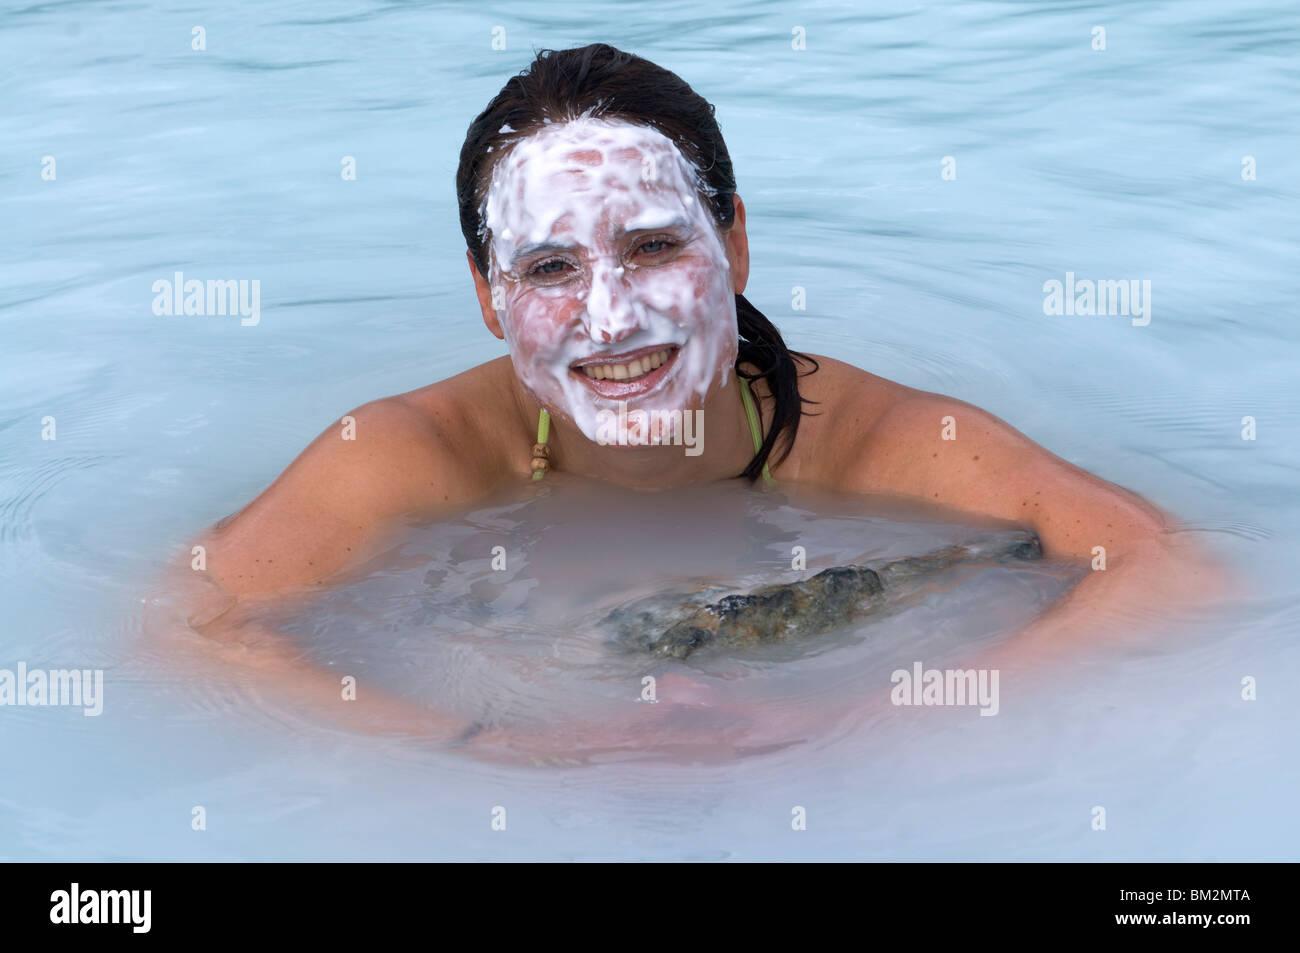 Young woman enjoying bathing in hot spring, Blue Lagoon, Iceland, Polar Regions - Stock Image